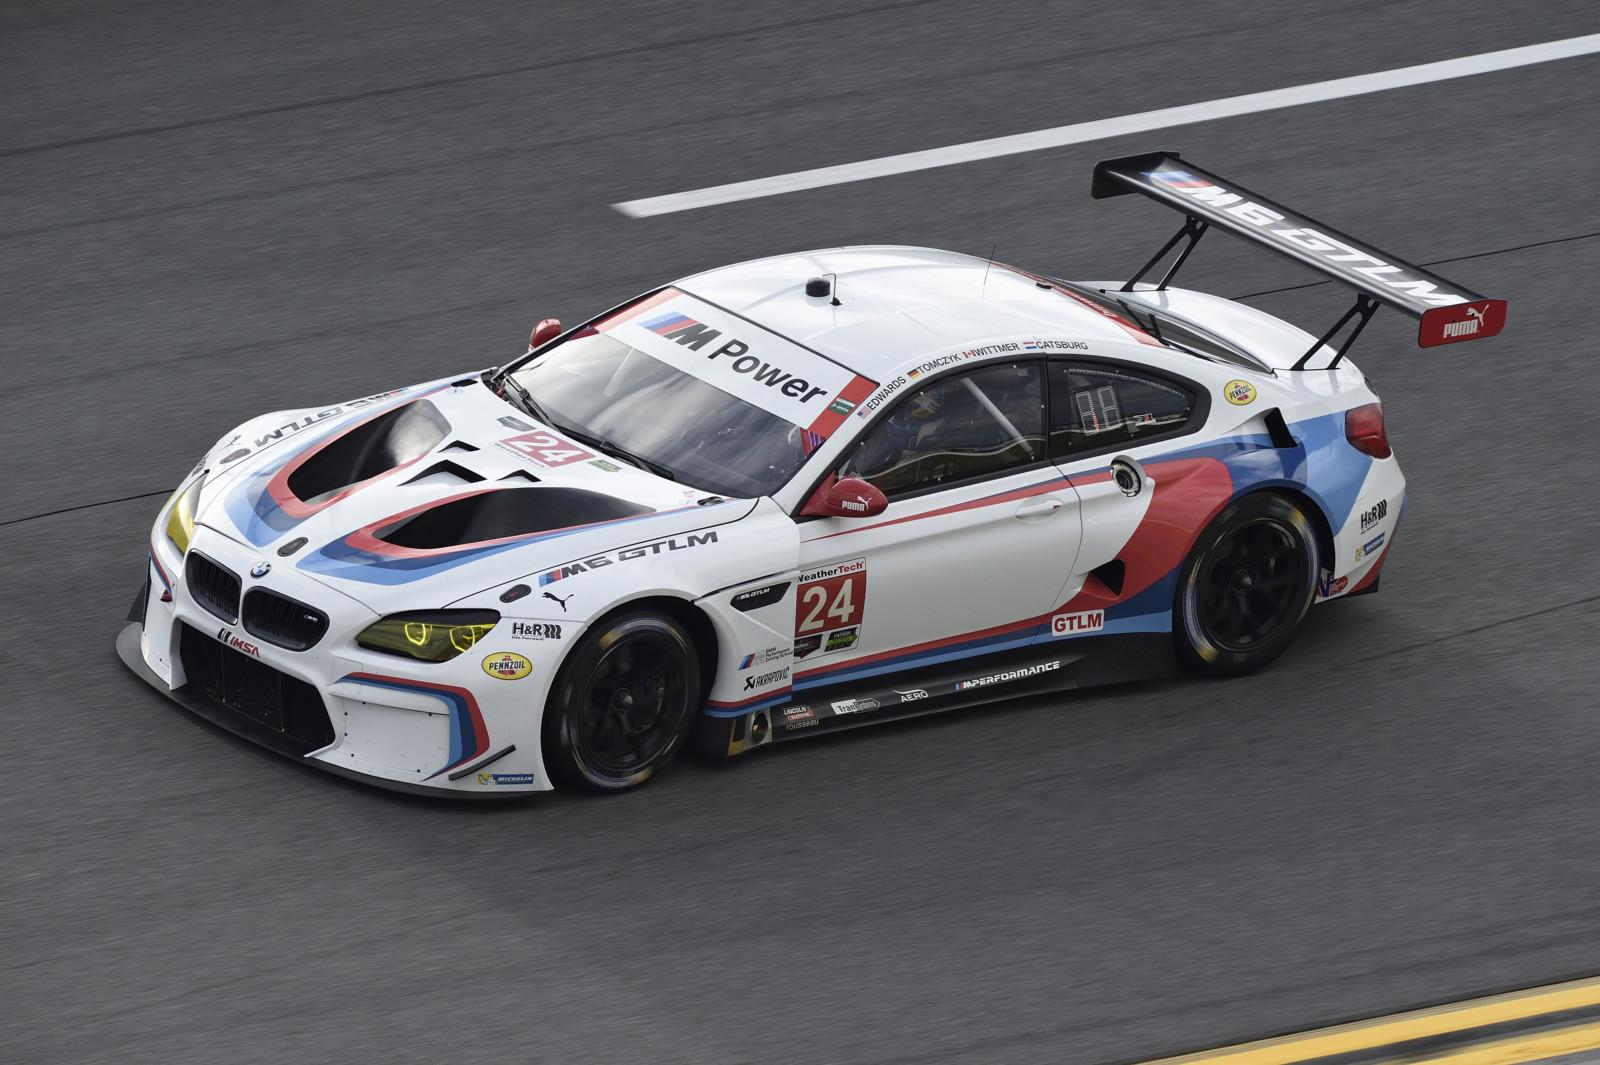 BMW-RLL-Daytona24h-qualy